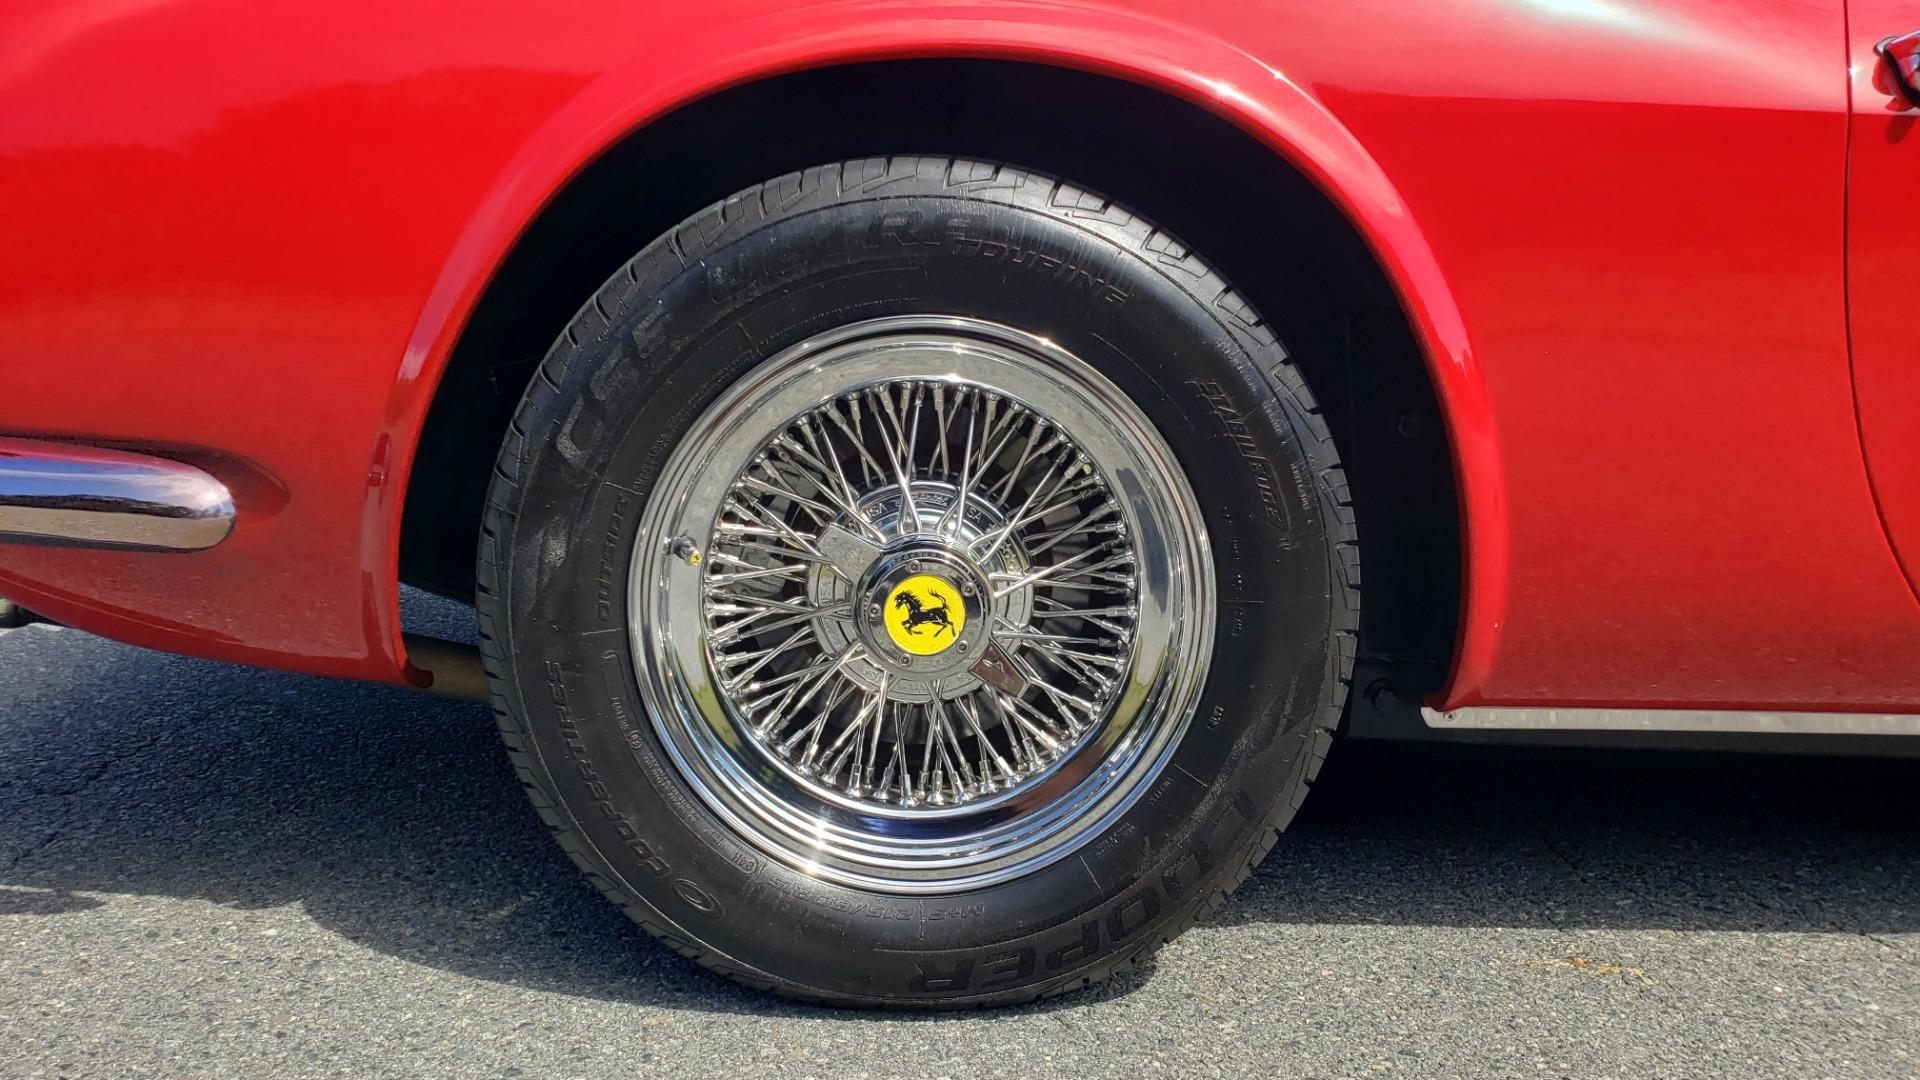 Used 1961 Ferrari 250GT SWB CALIFORNIA REPLICA / 302CI V8 / TREMEC 5-SPEED for sale Sold at Formula Imports in Charlotte NC 28227 58